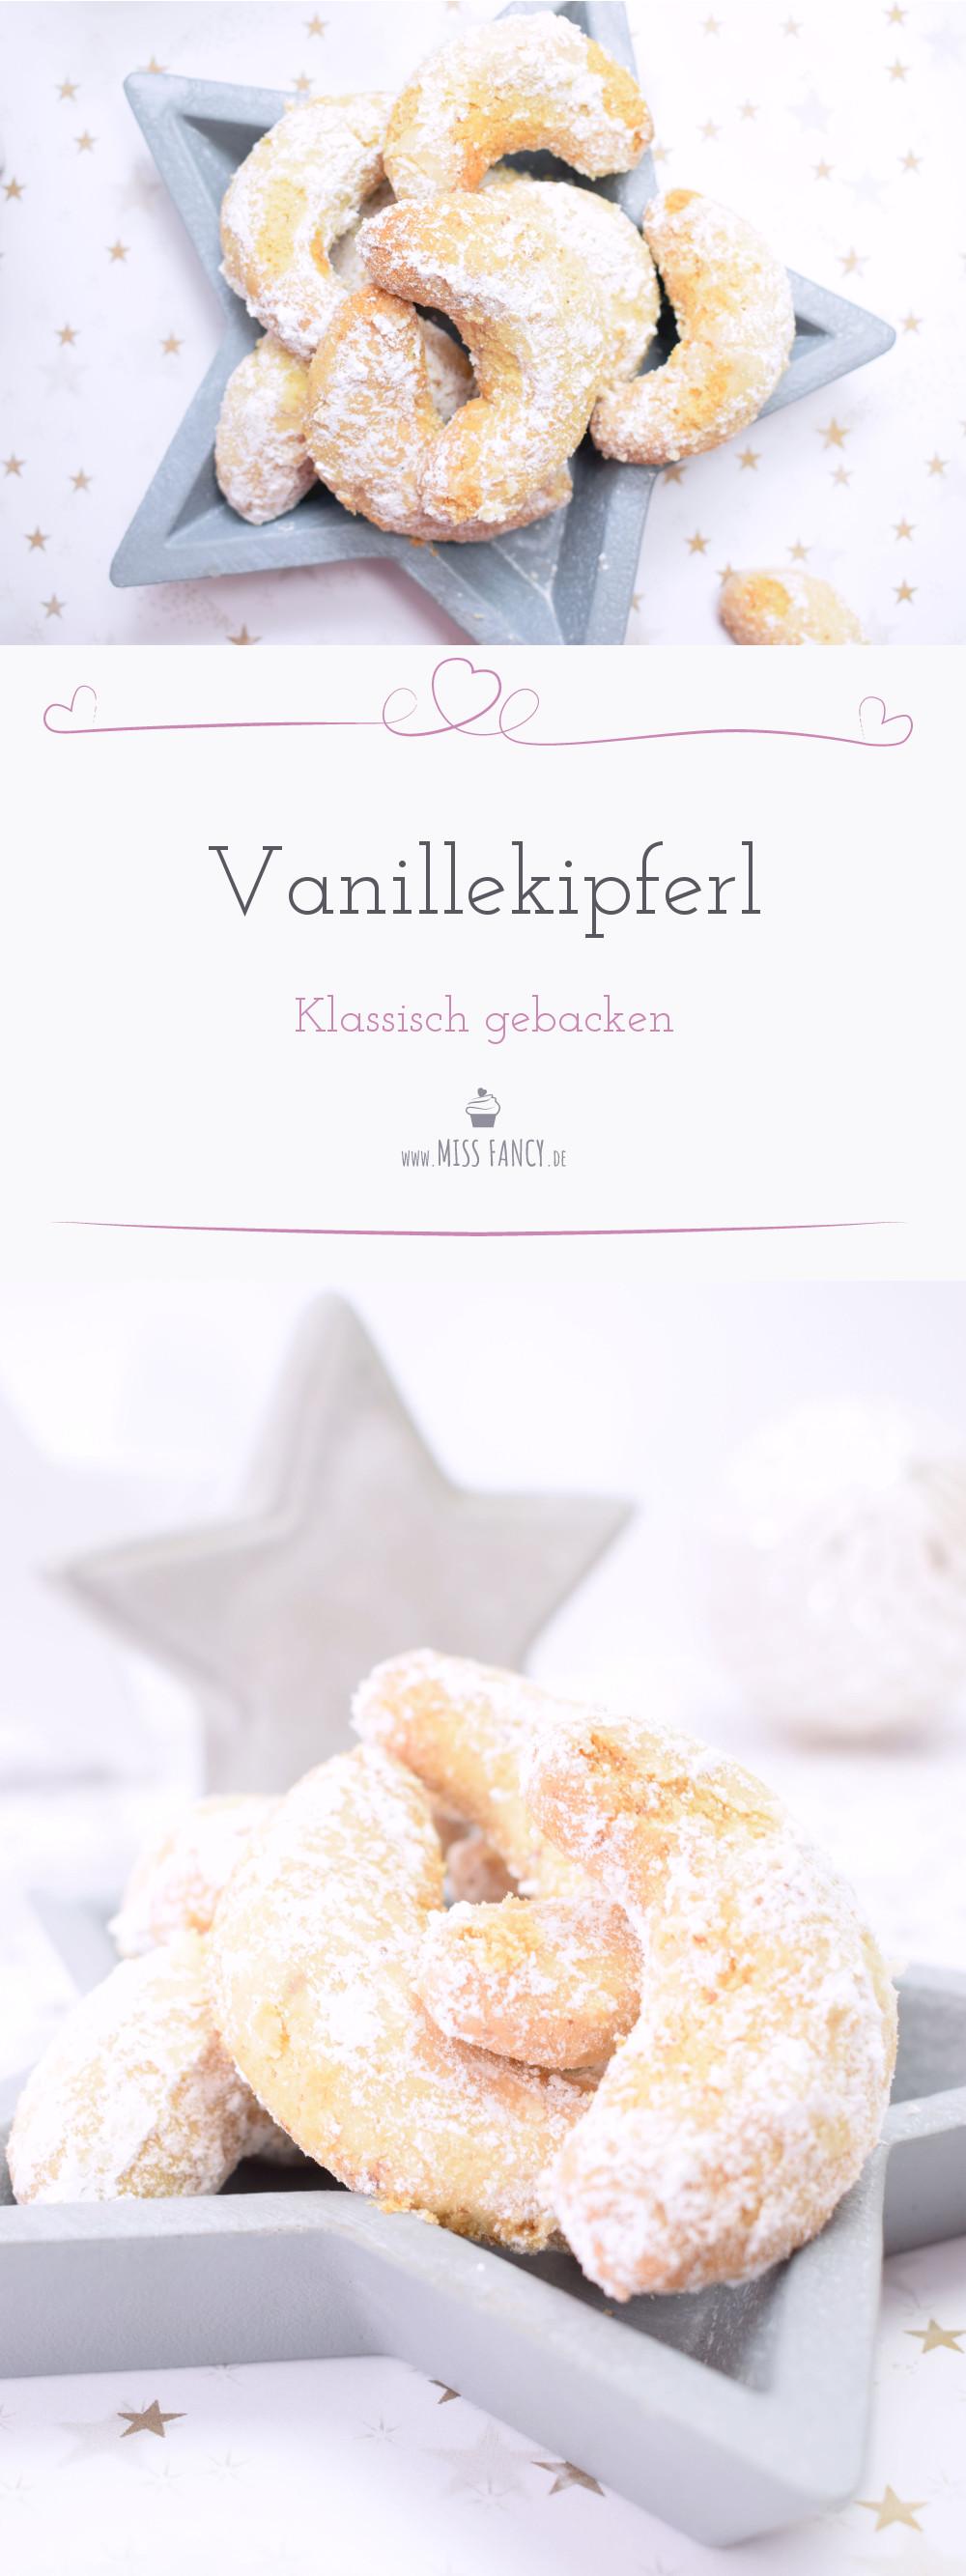 REZEPT-Vanillekipferl Missfancy